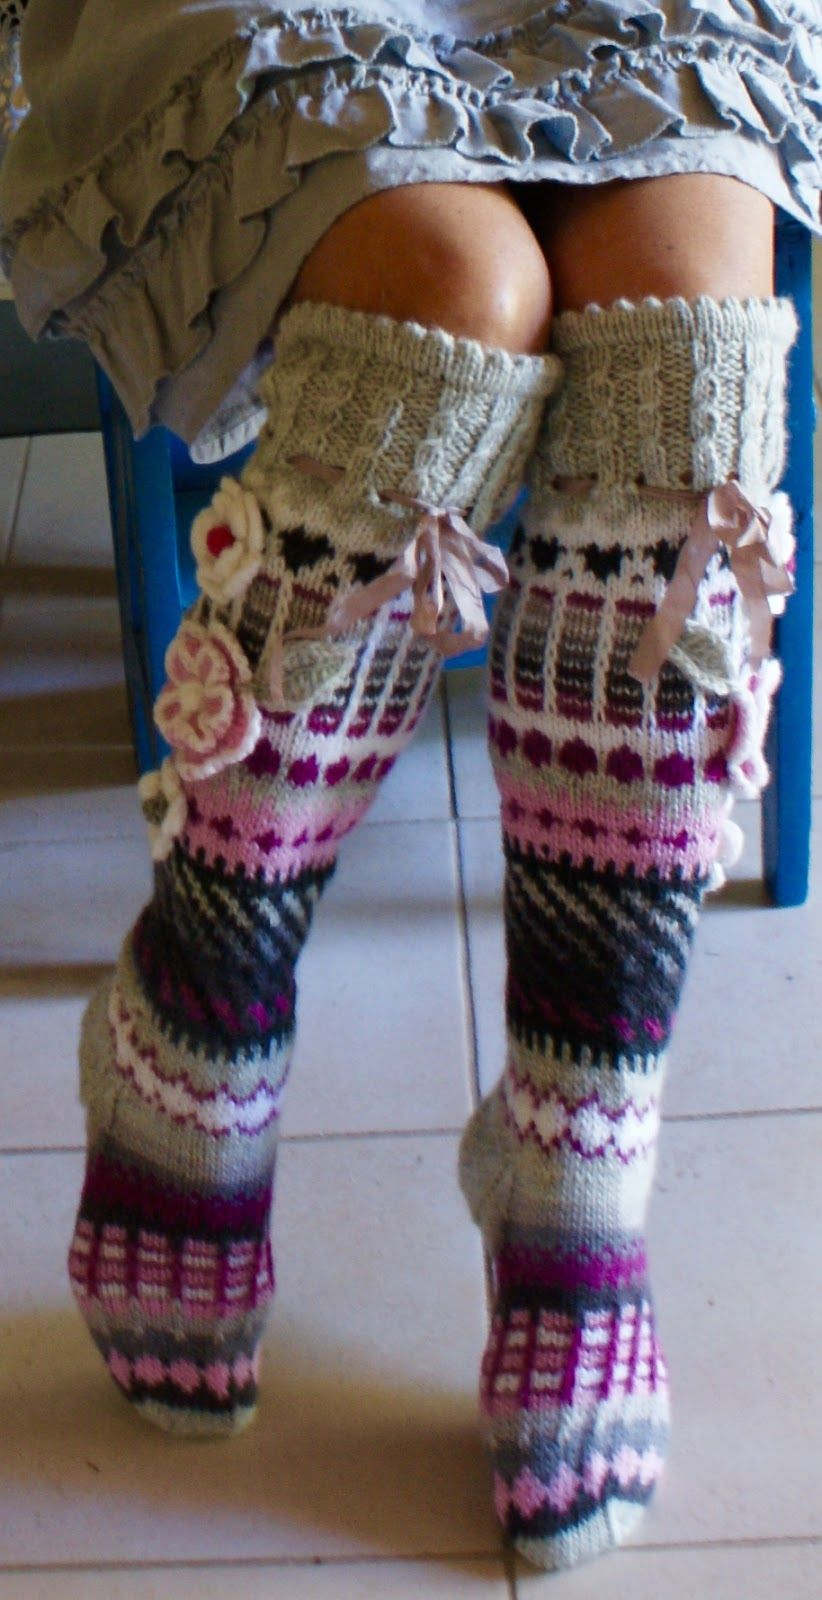 Ankortit she makes the most beautiful socks